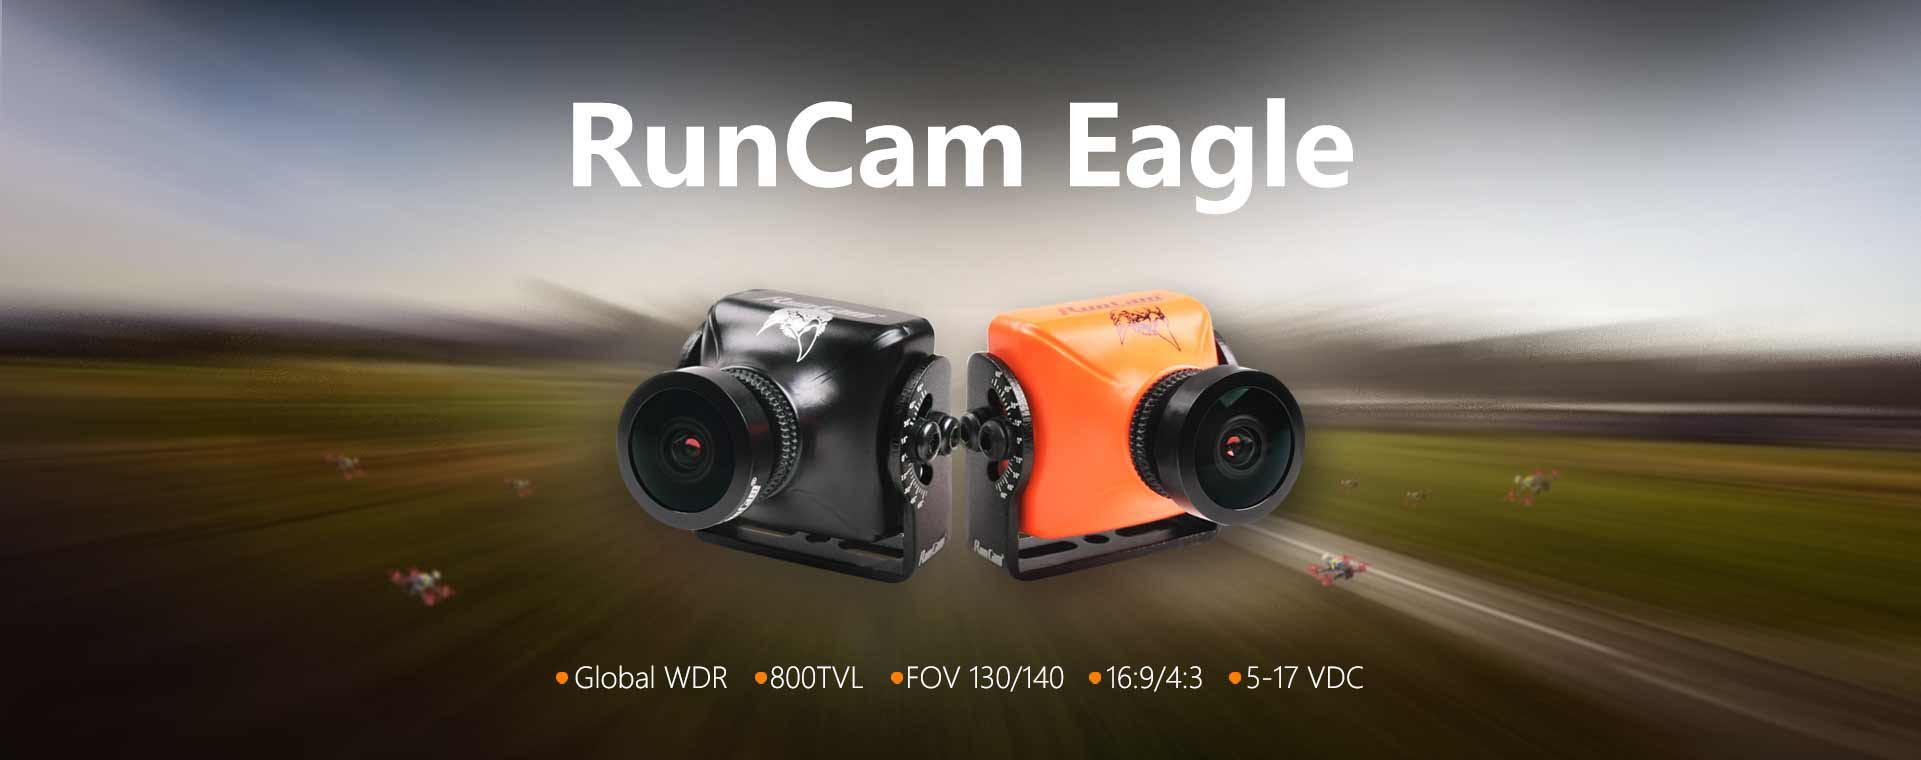 RunCam Eagle